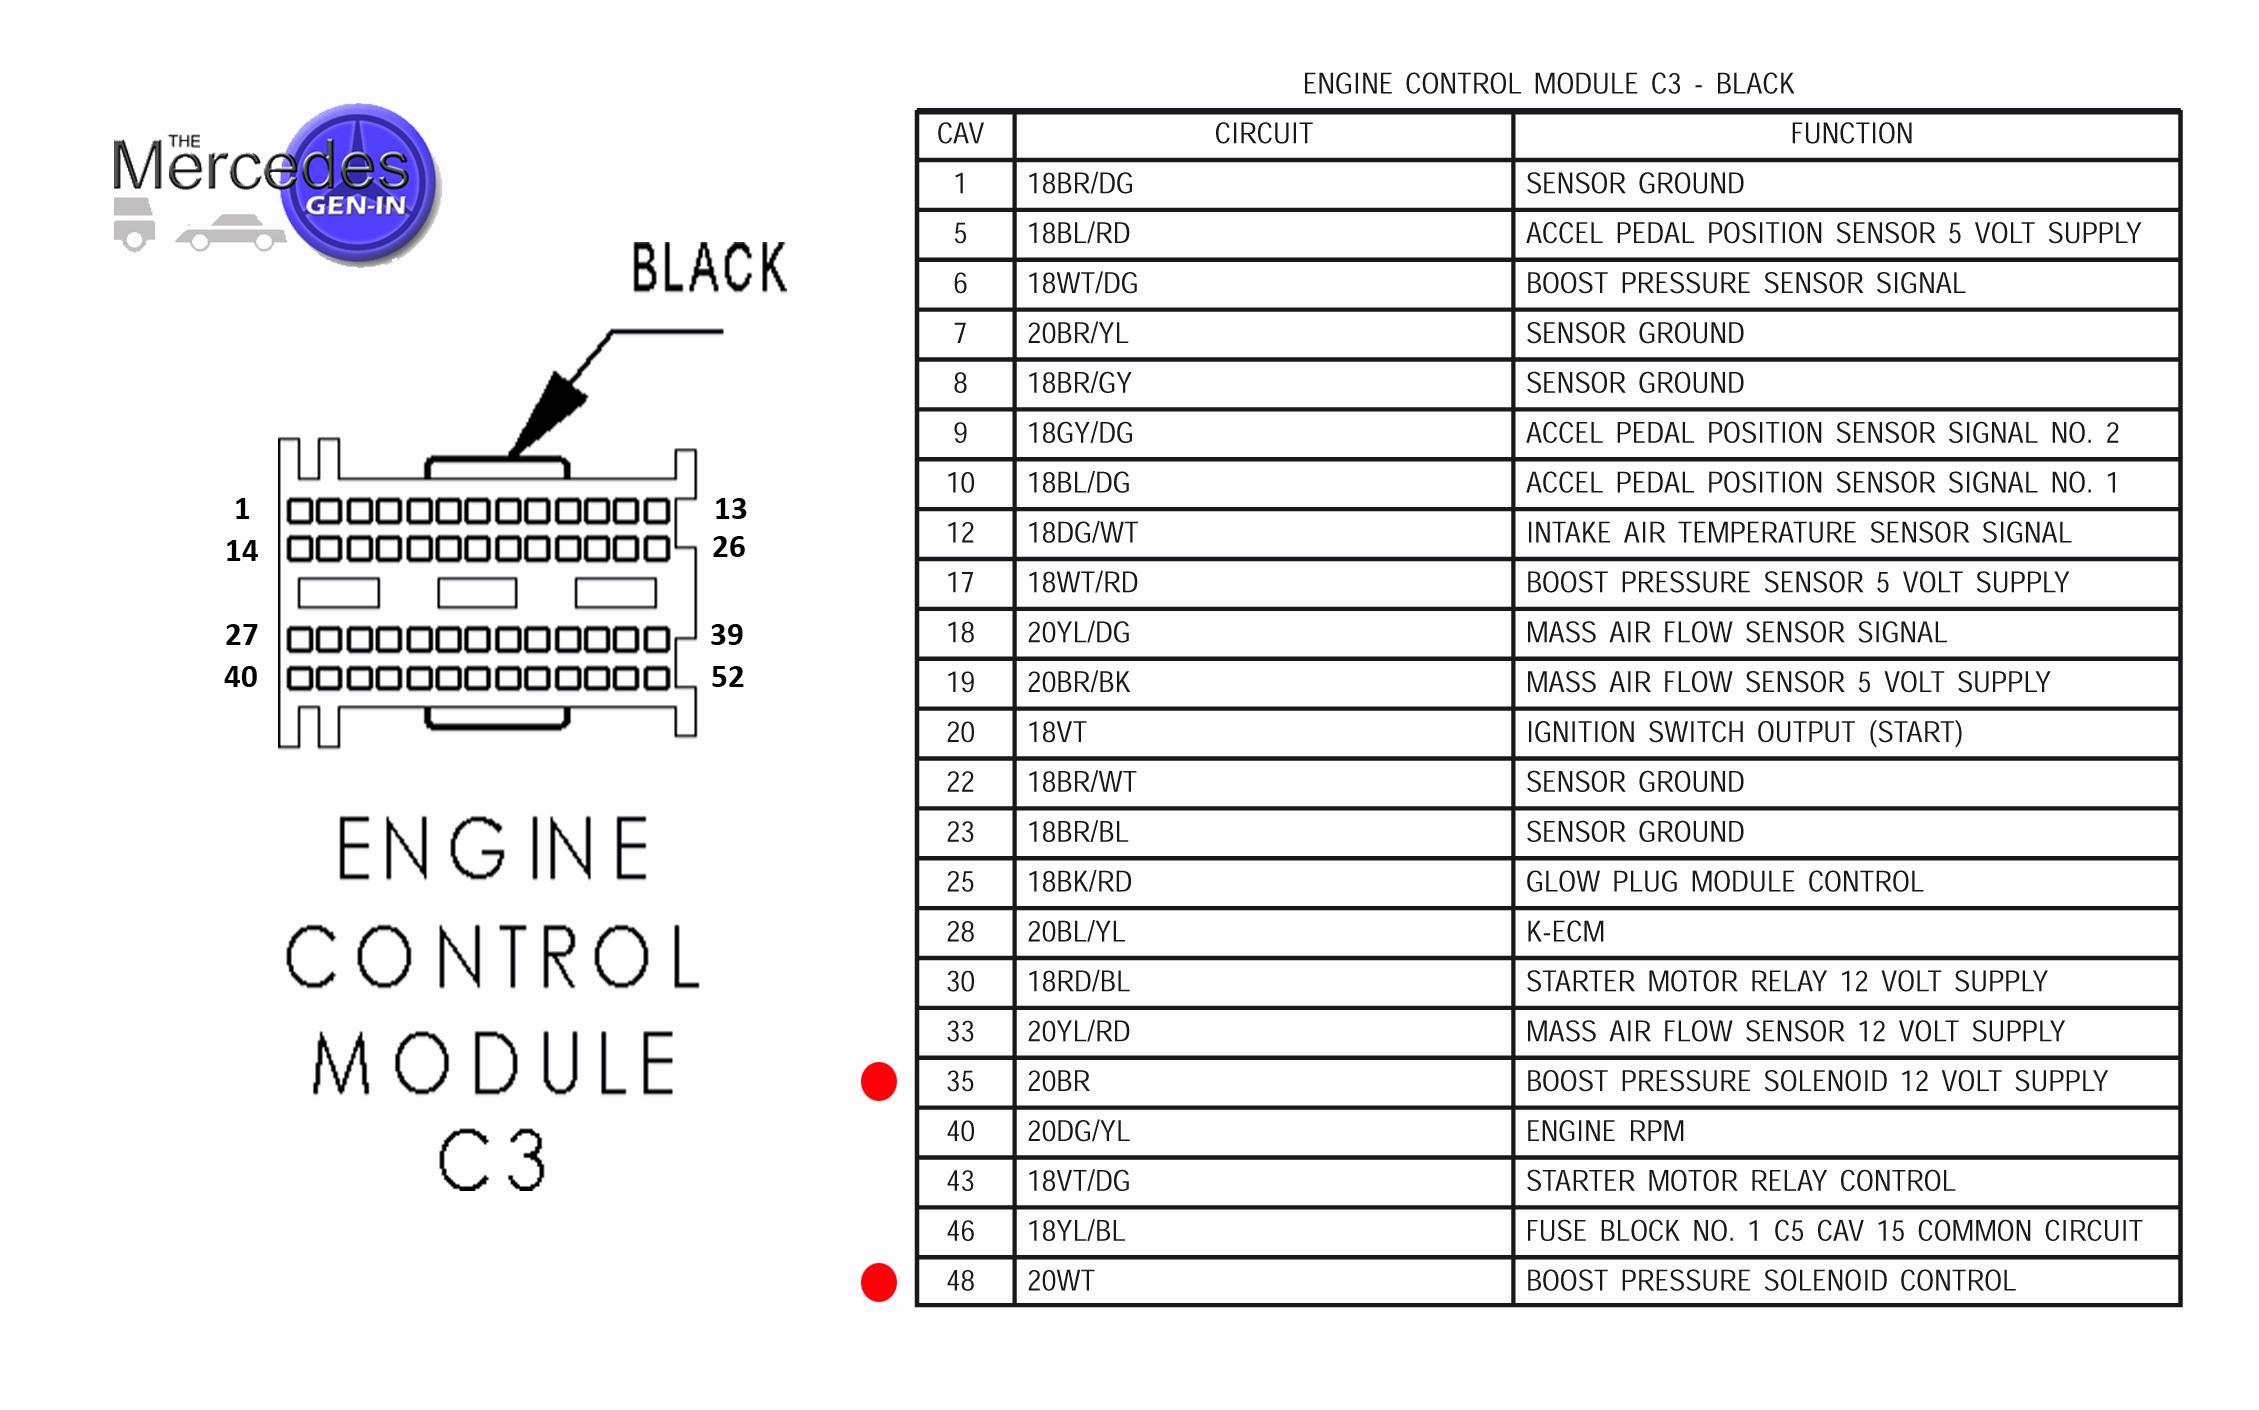 2014 mercedes benz sprinter fuse box diagram data wiring diagrams u2022 rh mikeadkinsguitar com